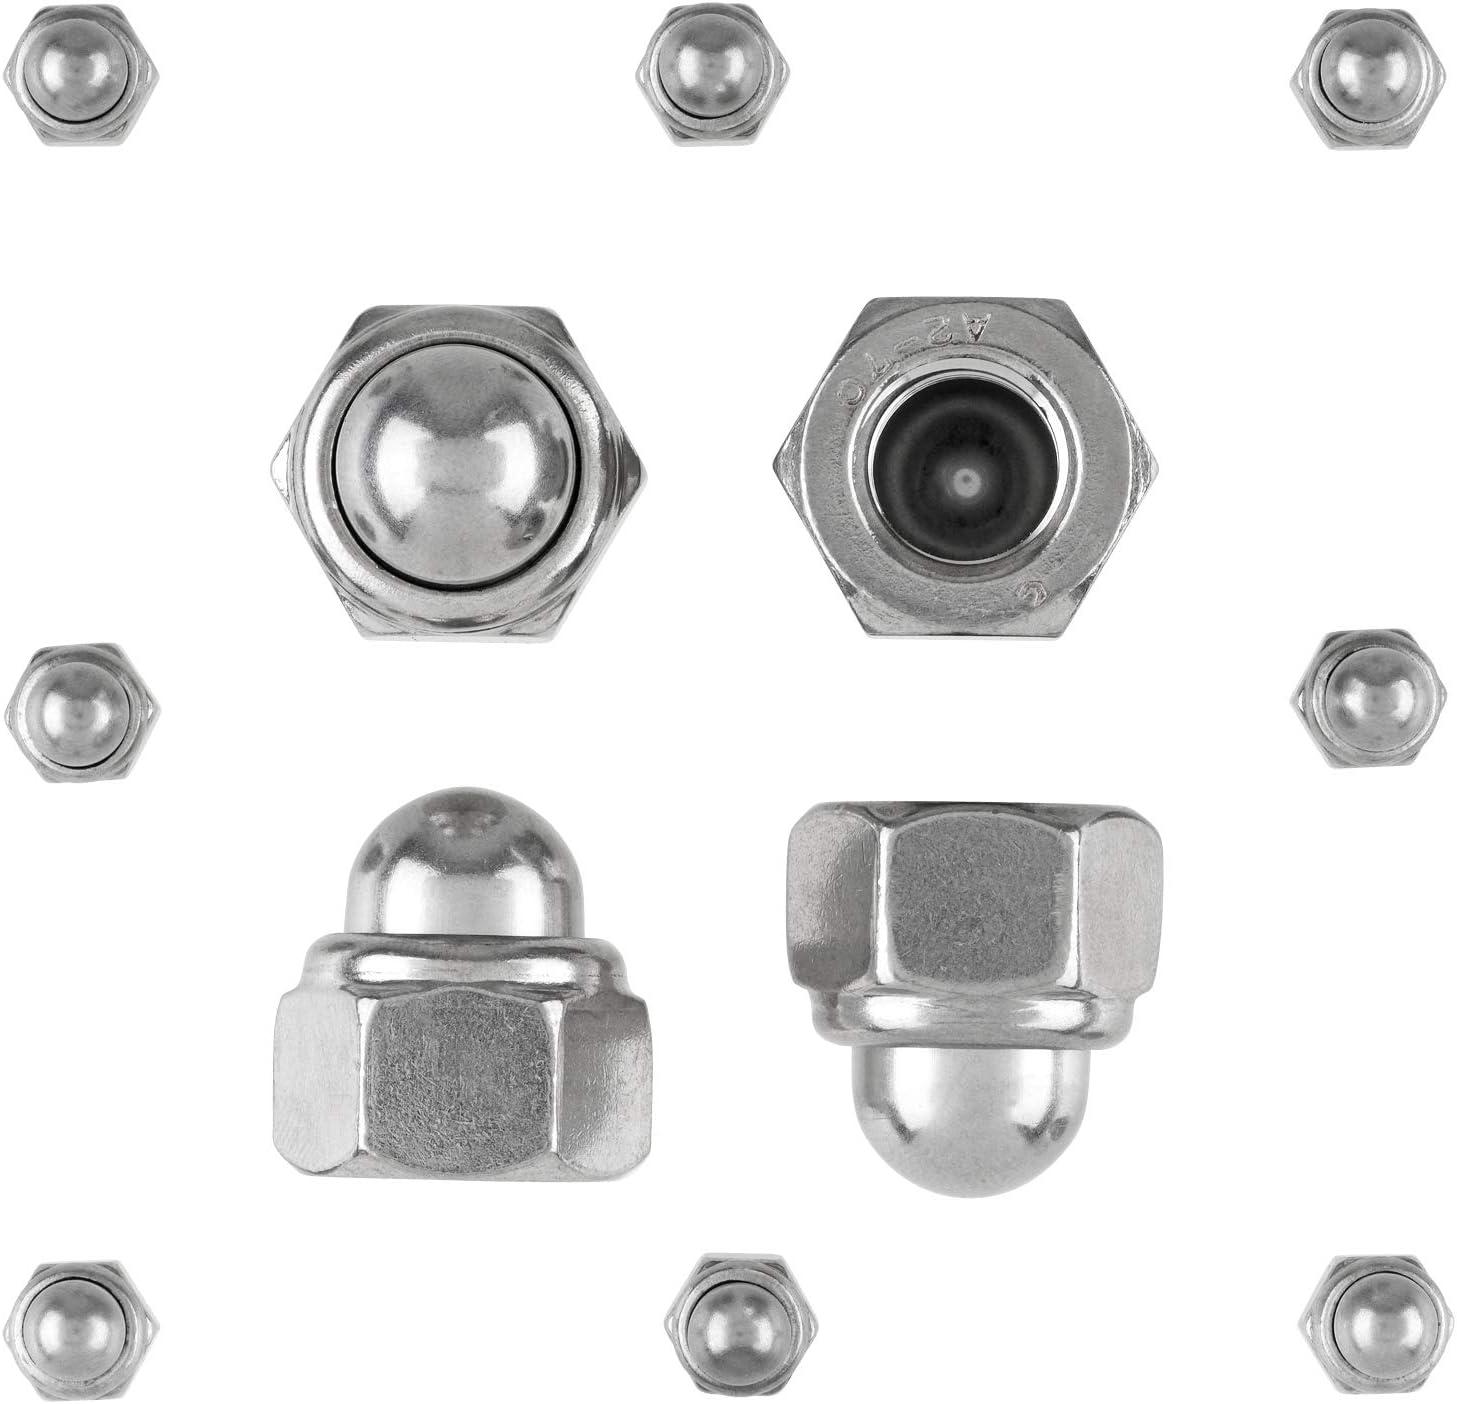 Edelstahl A2 - Sechskant-Hutmuttern Stopmuttern Sicherungsmuttern 20 St/ück Hutmuttern M6 DIN 986 selbstsichernd